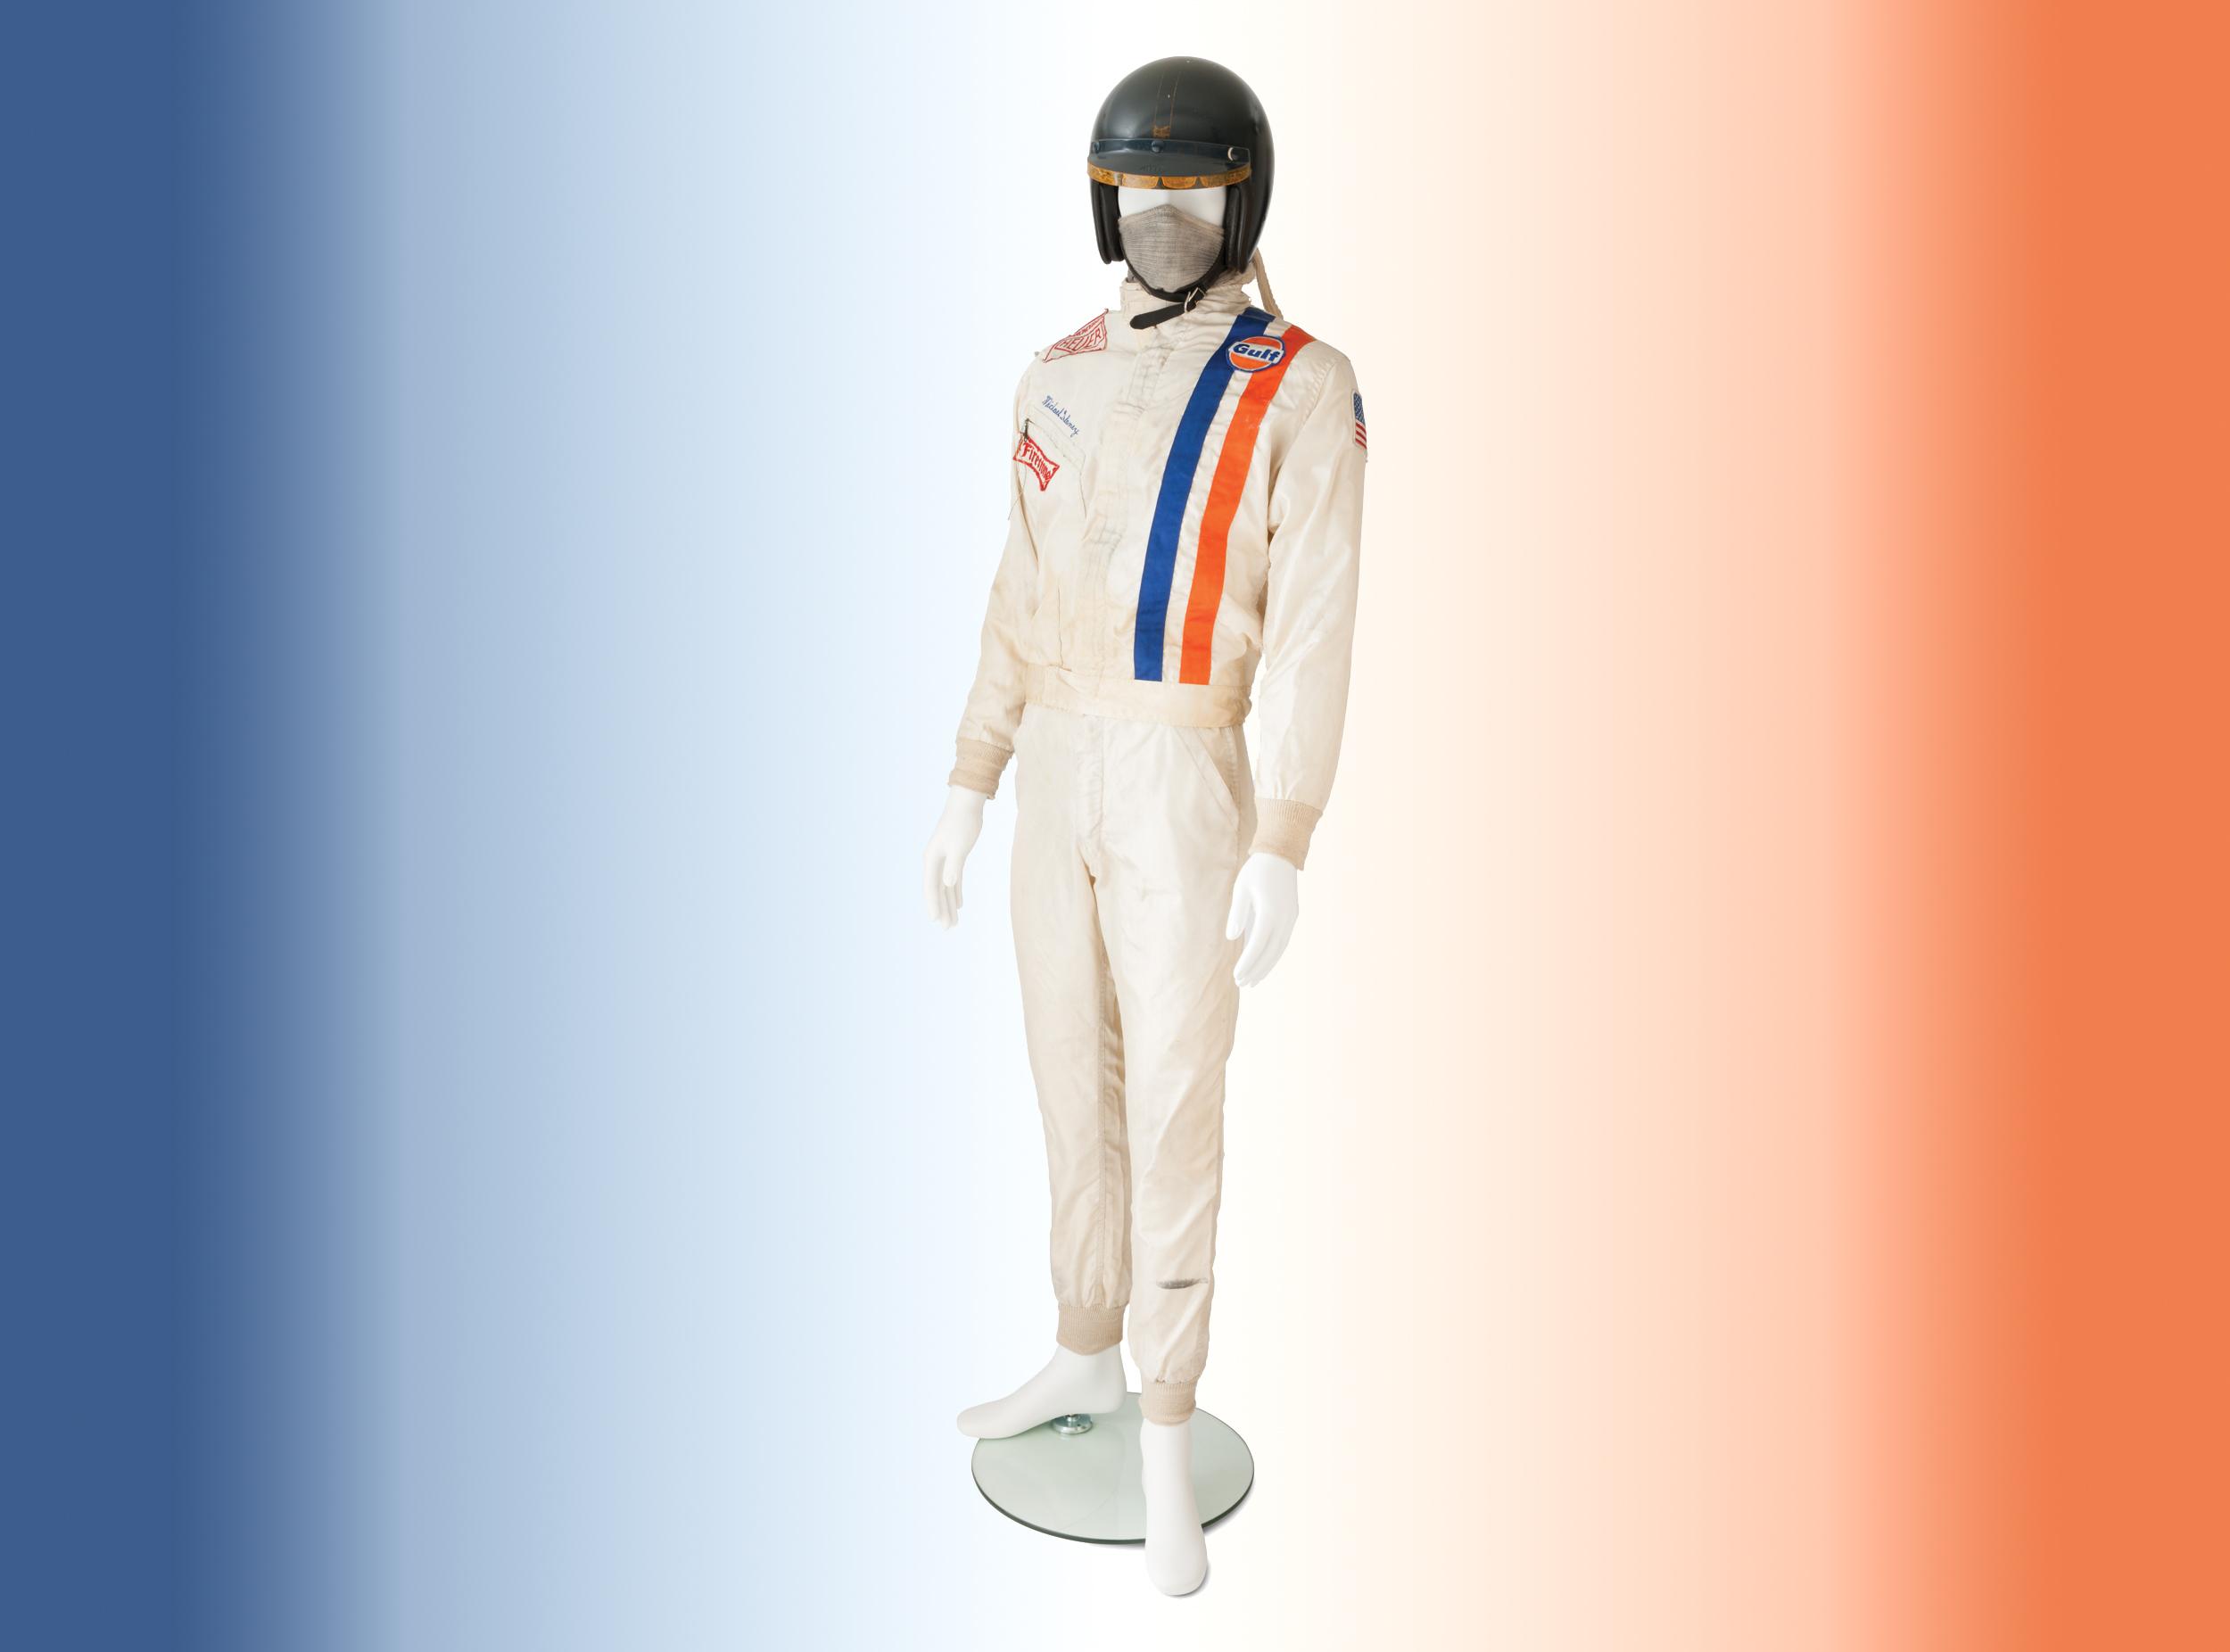 Steve McQueen's Le Mans overalls and helmet